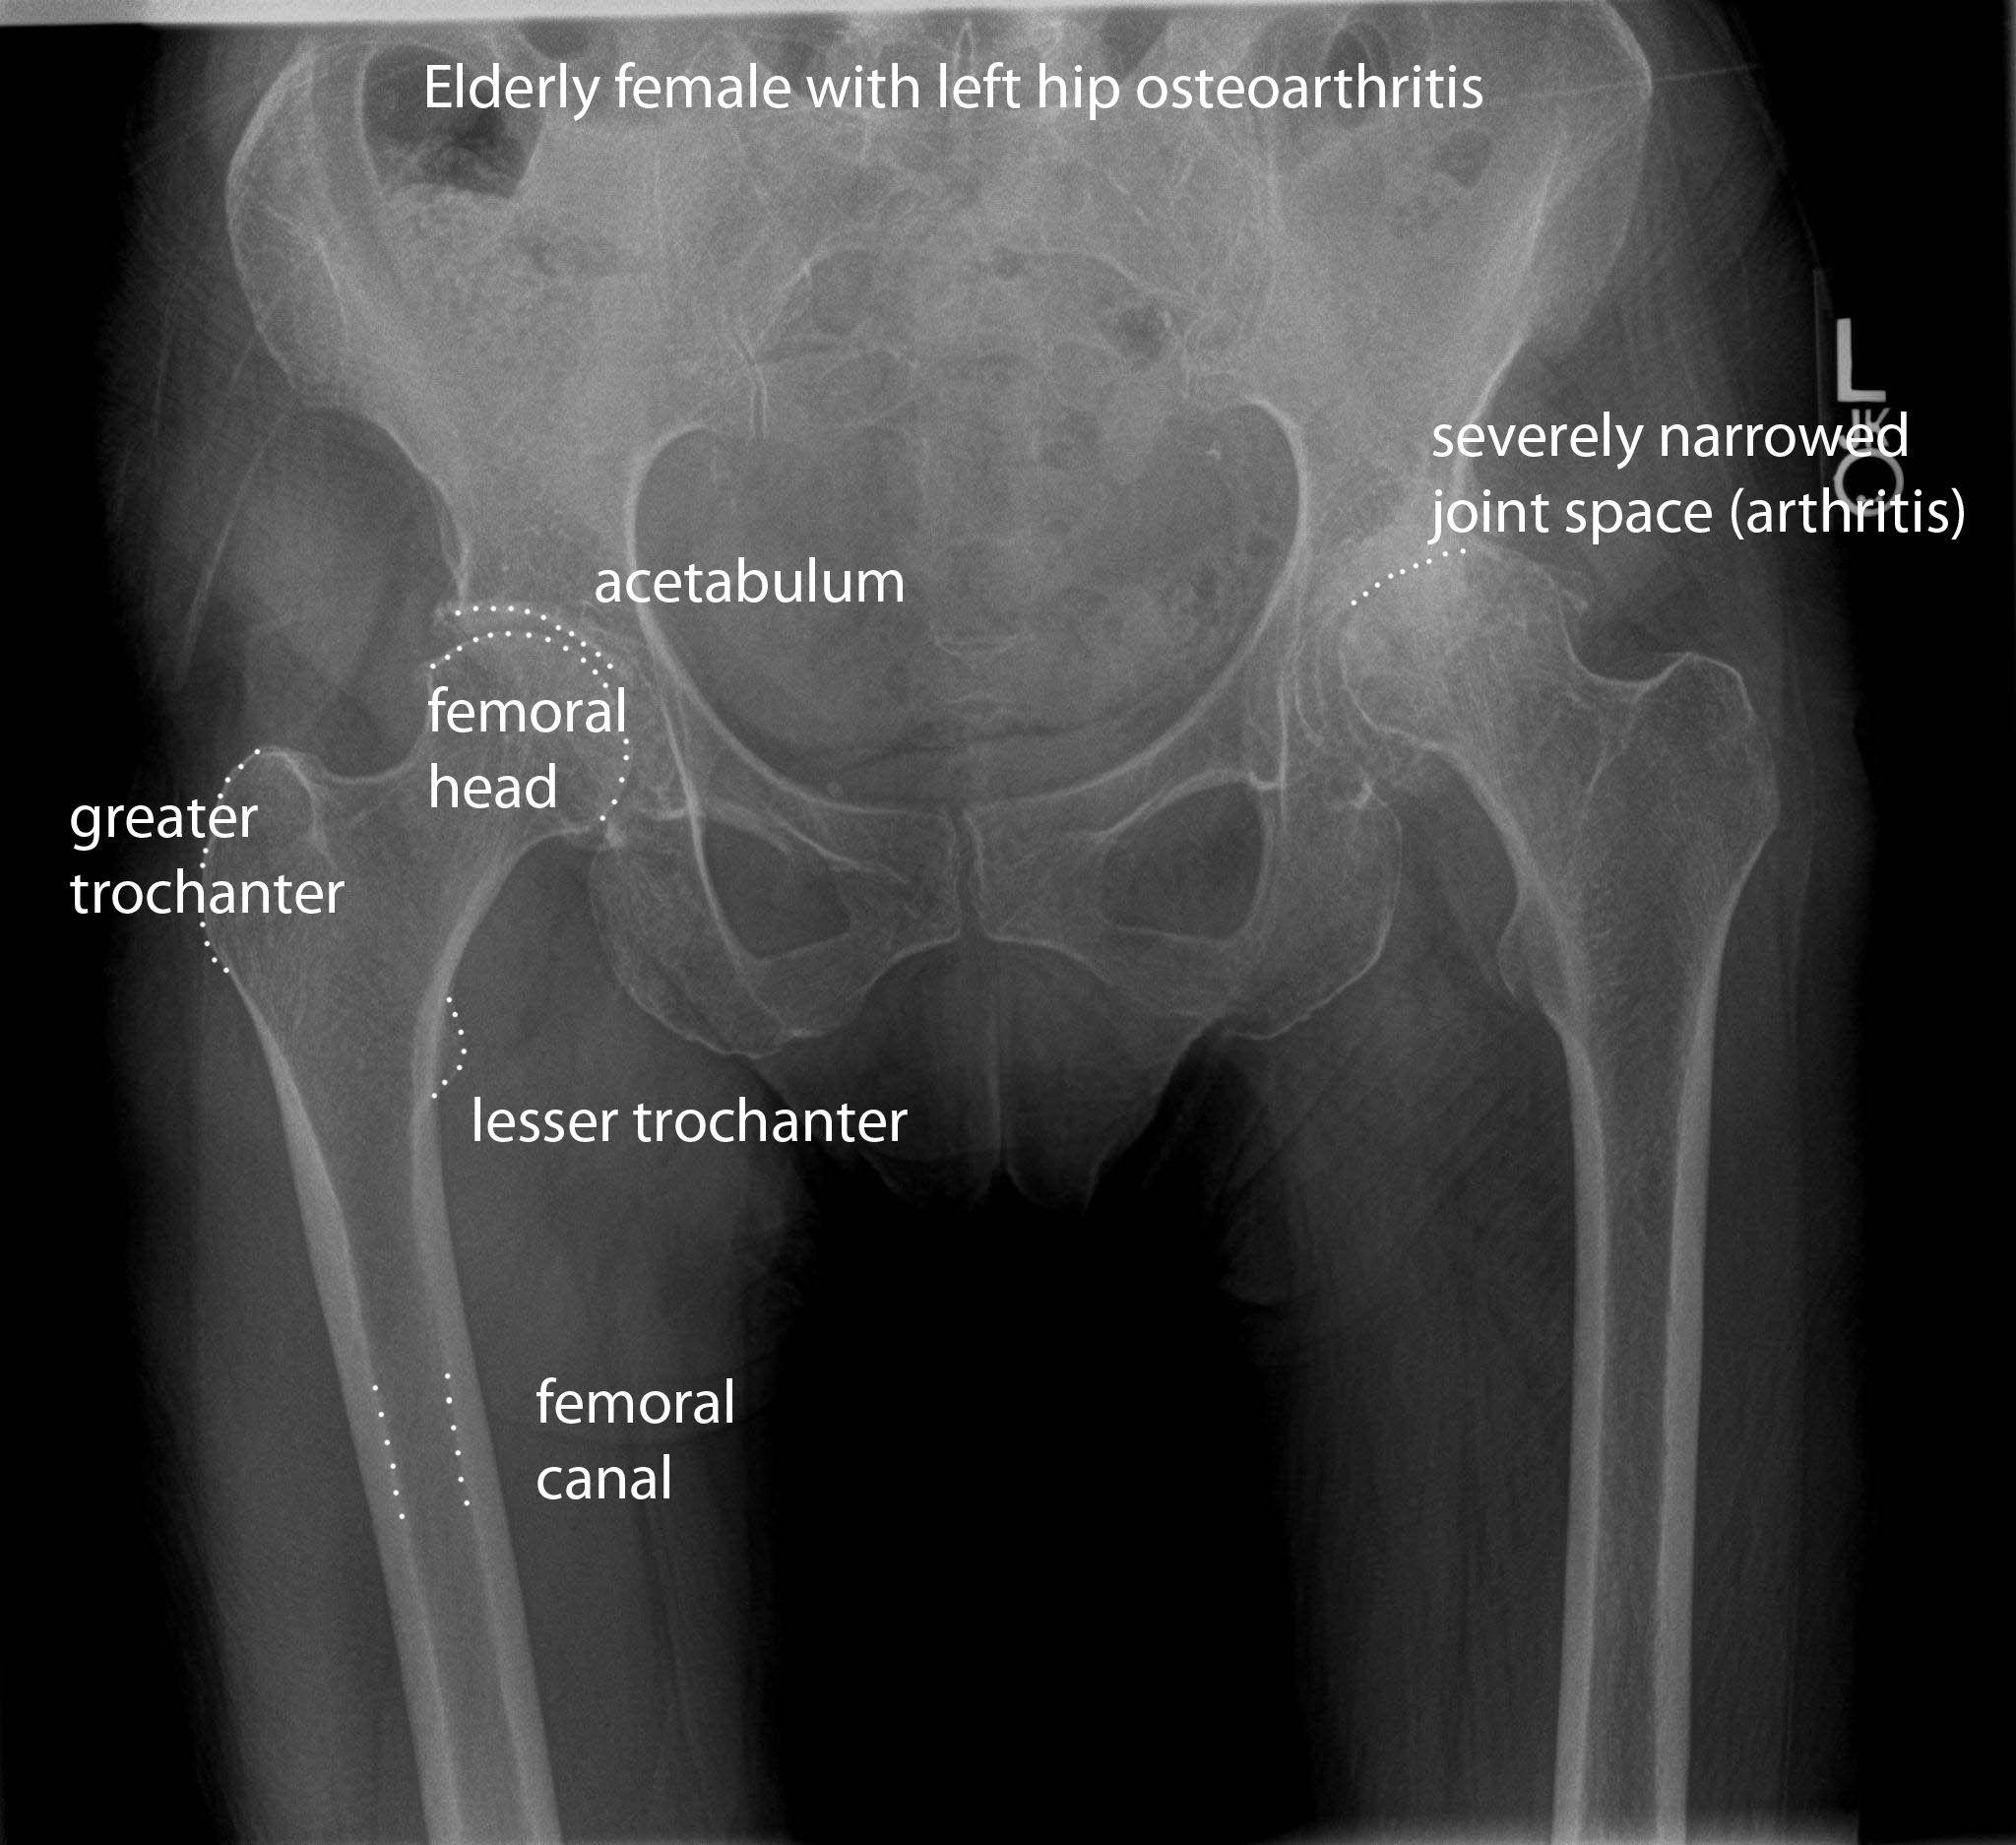 pelvis radiographic anatomy Normal vs OA | Radiographic anatomy ...